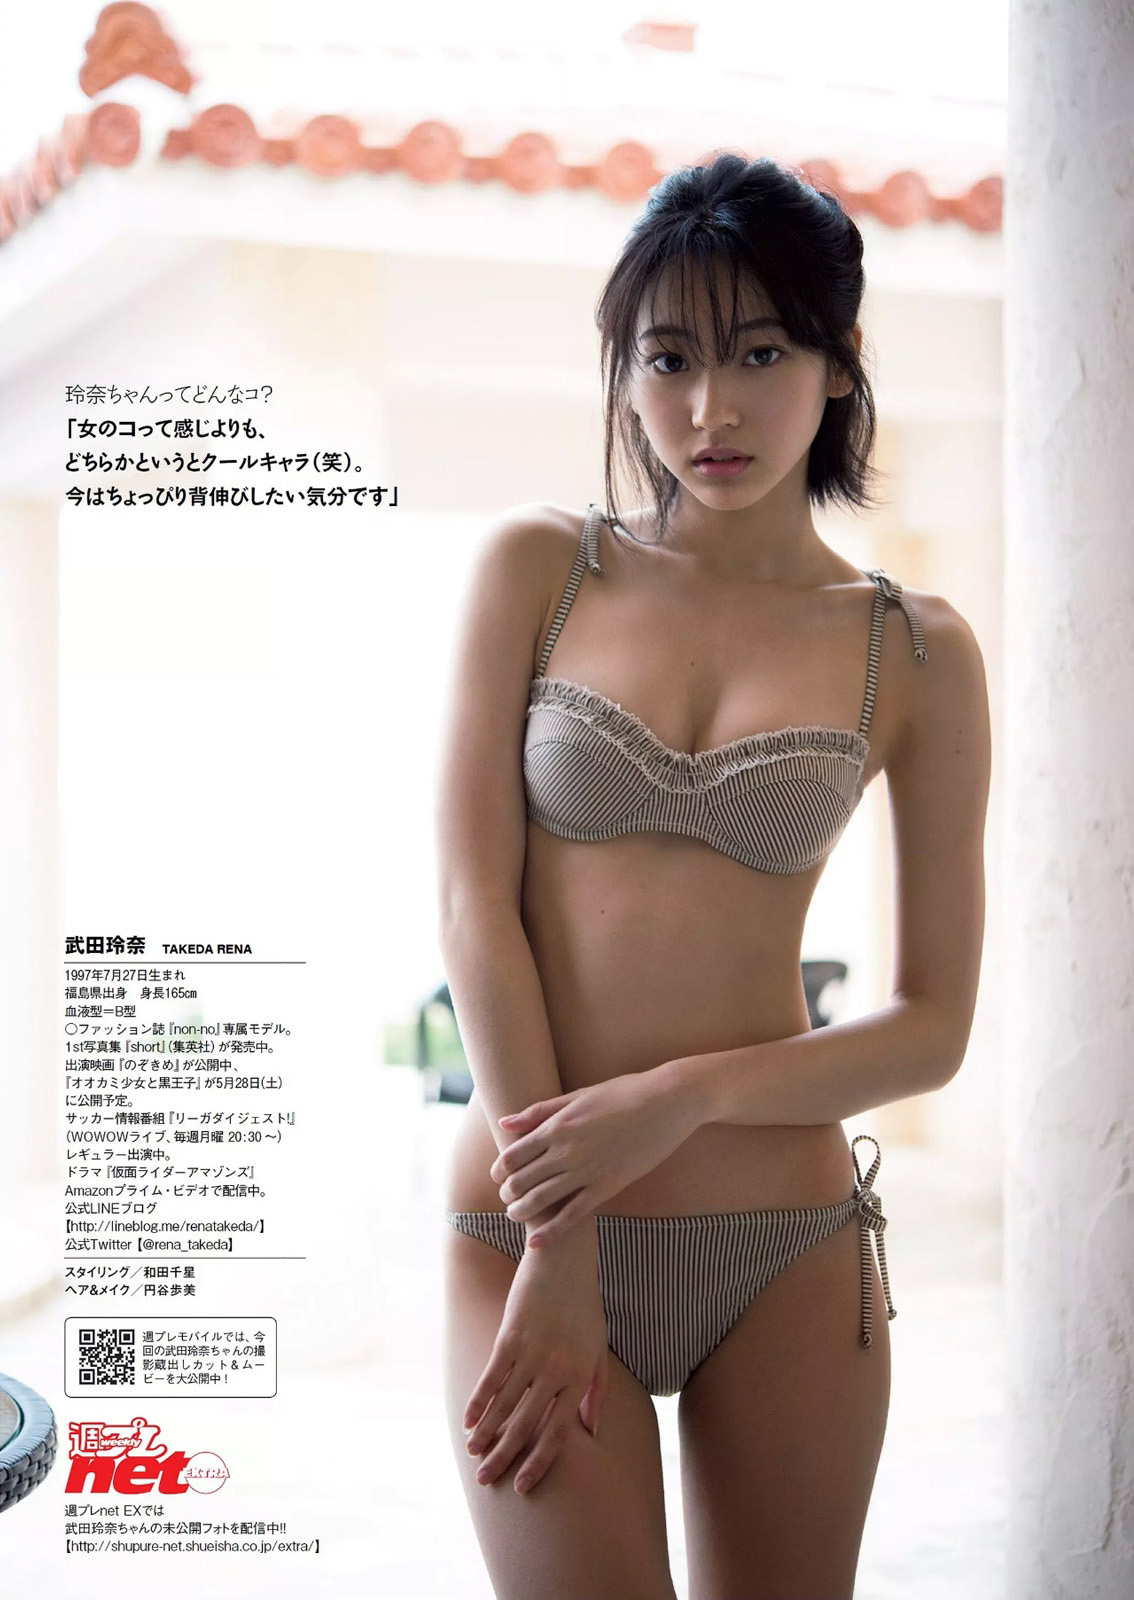 eyval.net: 武田玲奈. たけだ れな. Rena Takeda - Weekly Playboy / 2016.05.23